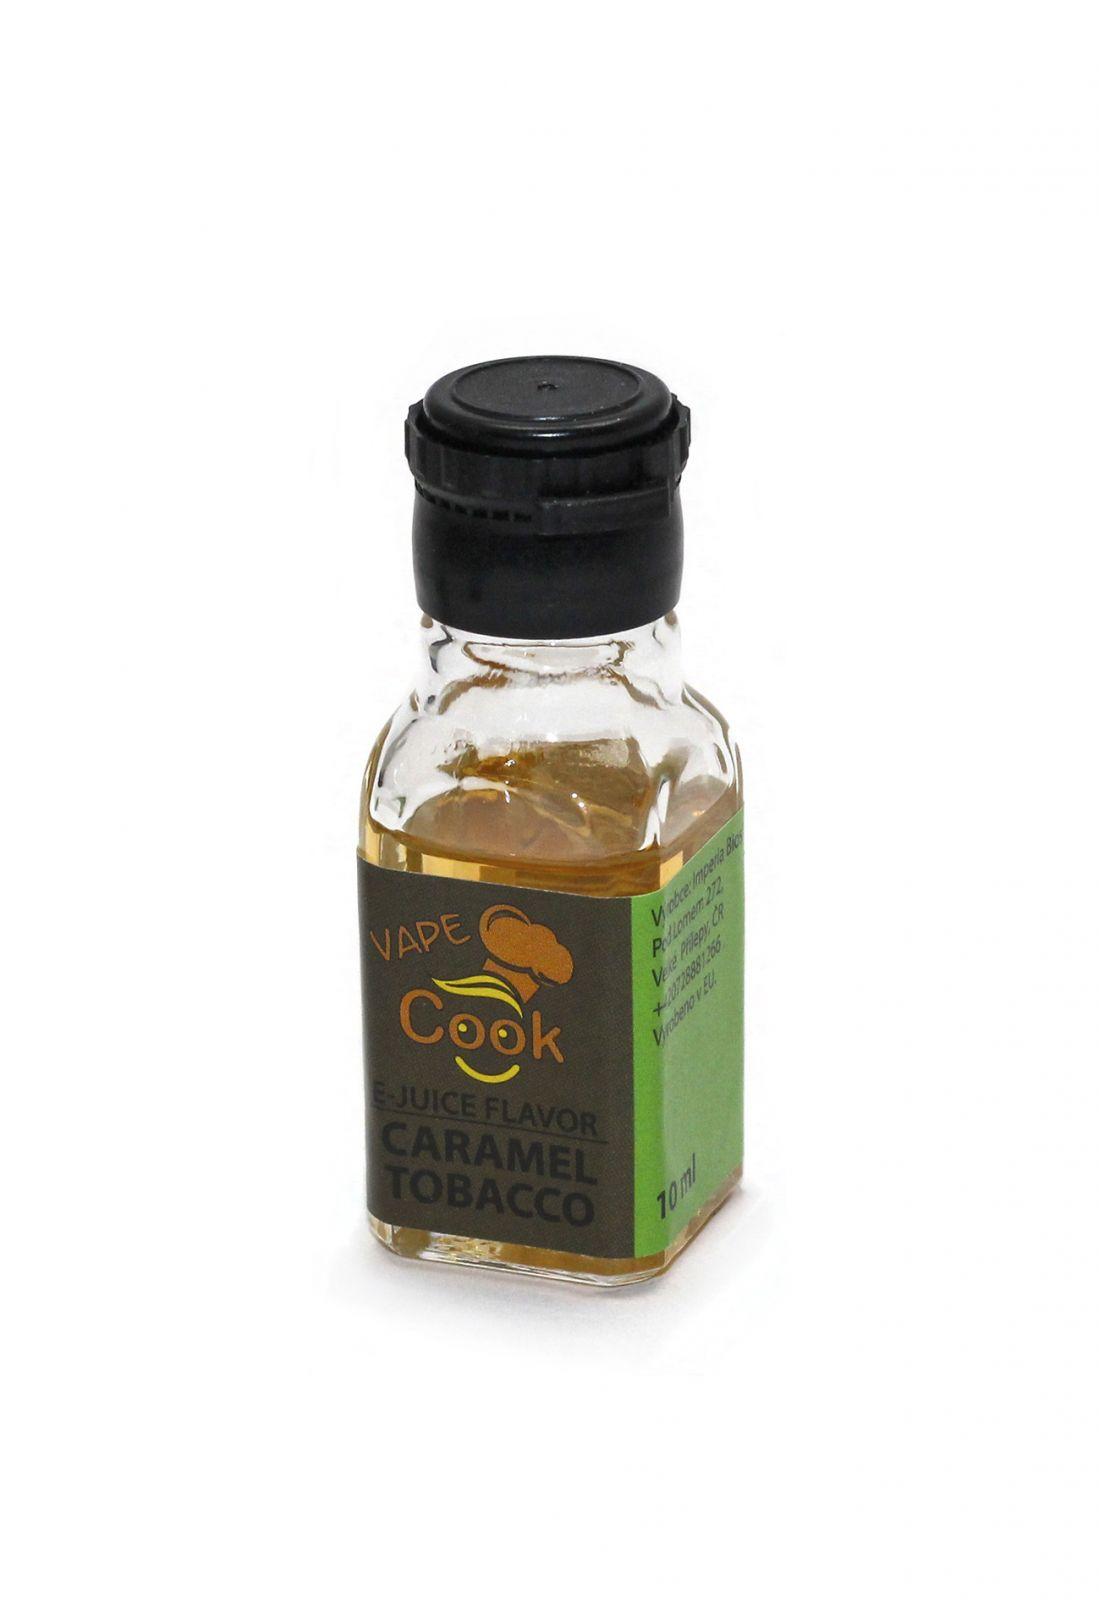 CARAMEL TOBACCO - Aroma Imperia Vape Cook Boudoir Samadhi s.r.o.